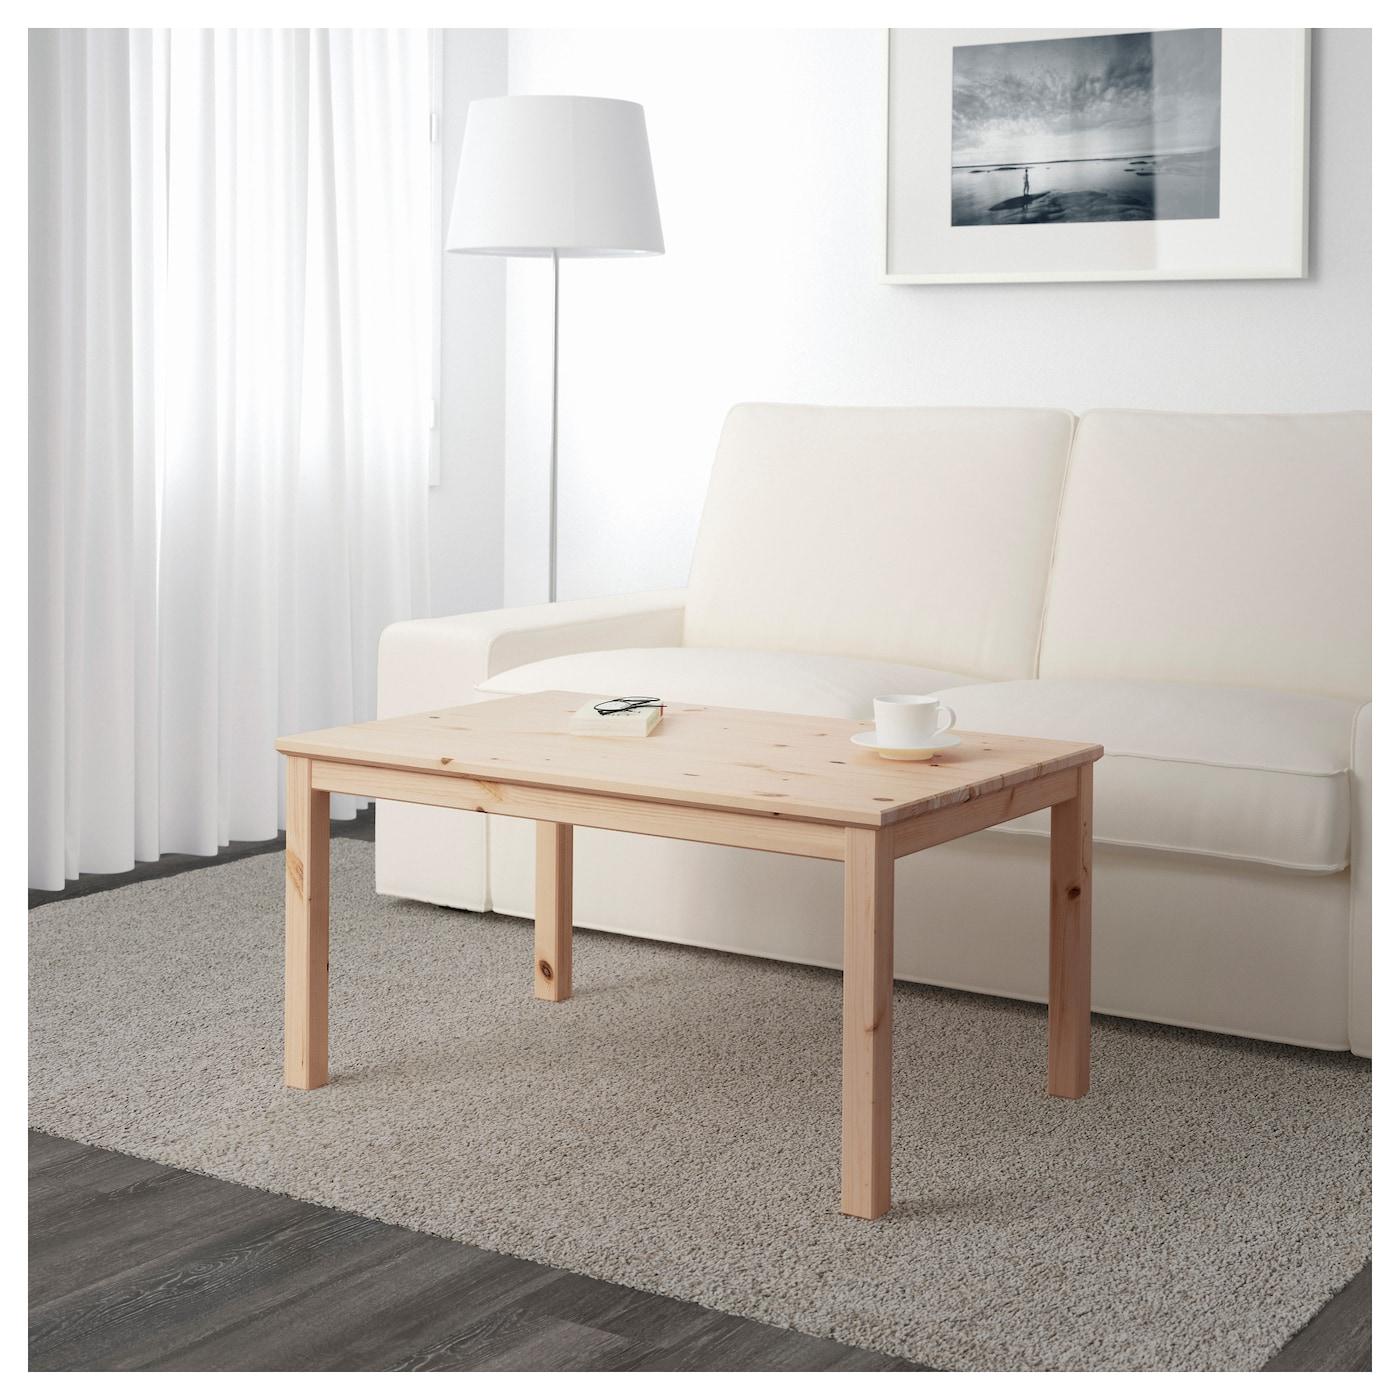 Superb Table En Pin Ikea #14: IKEA NORNÄS Coffee Table